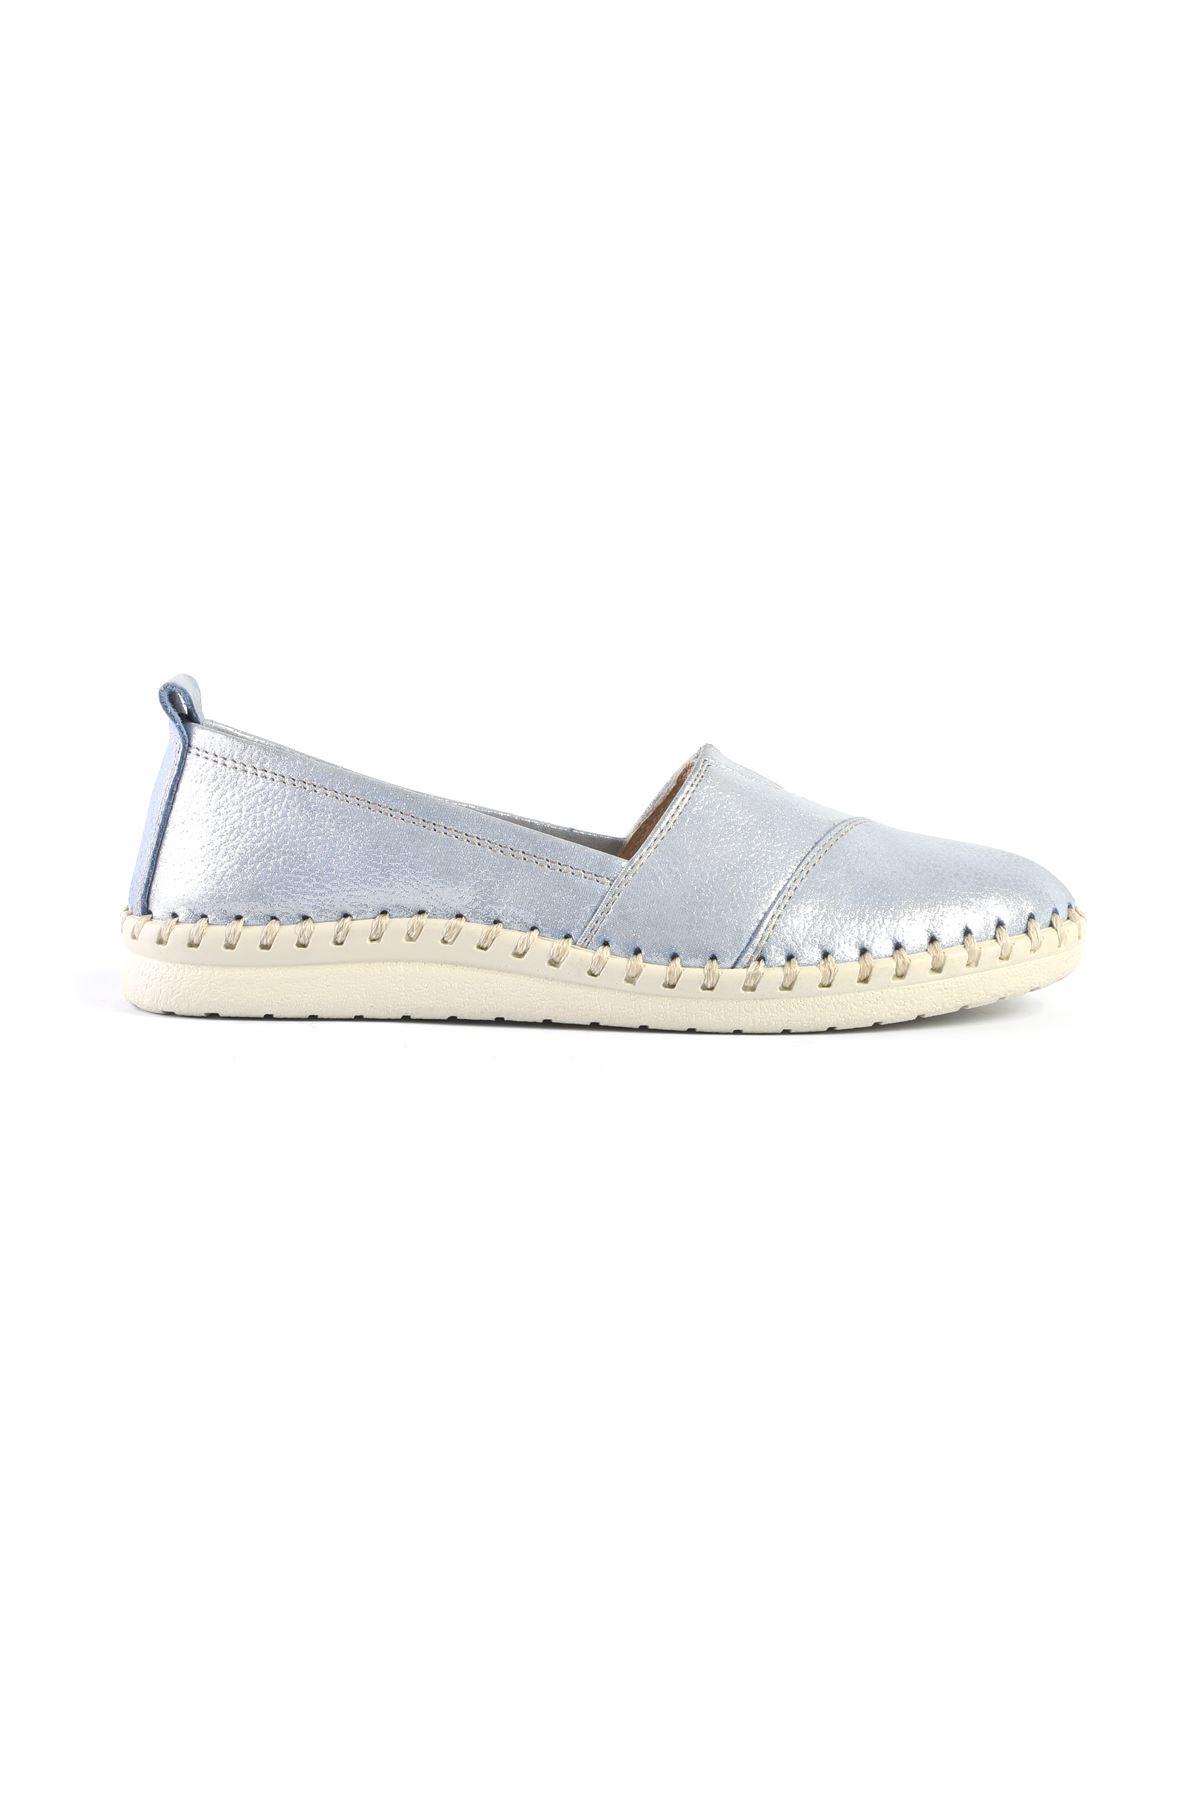 Libero AH6016 Mavi Babet Ayakkabı